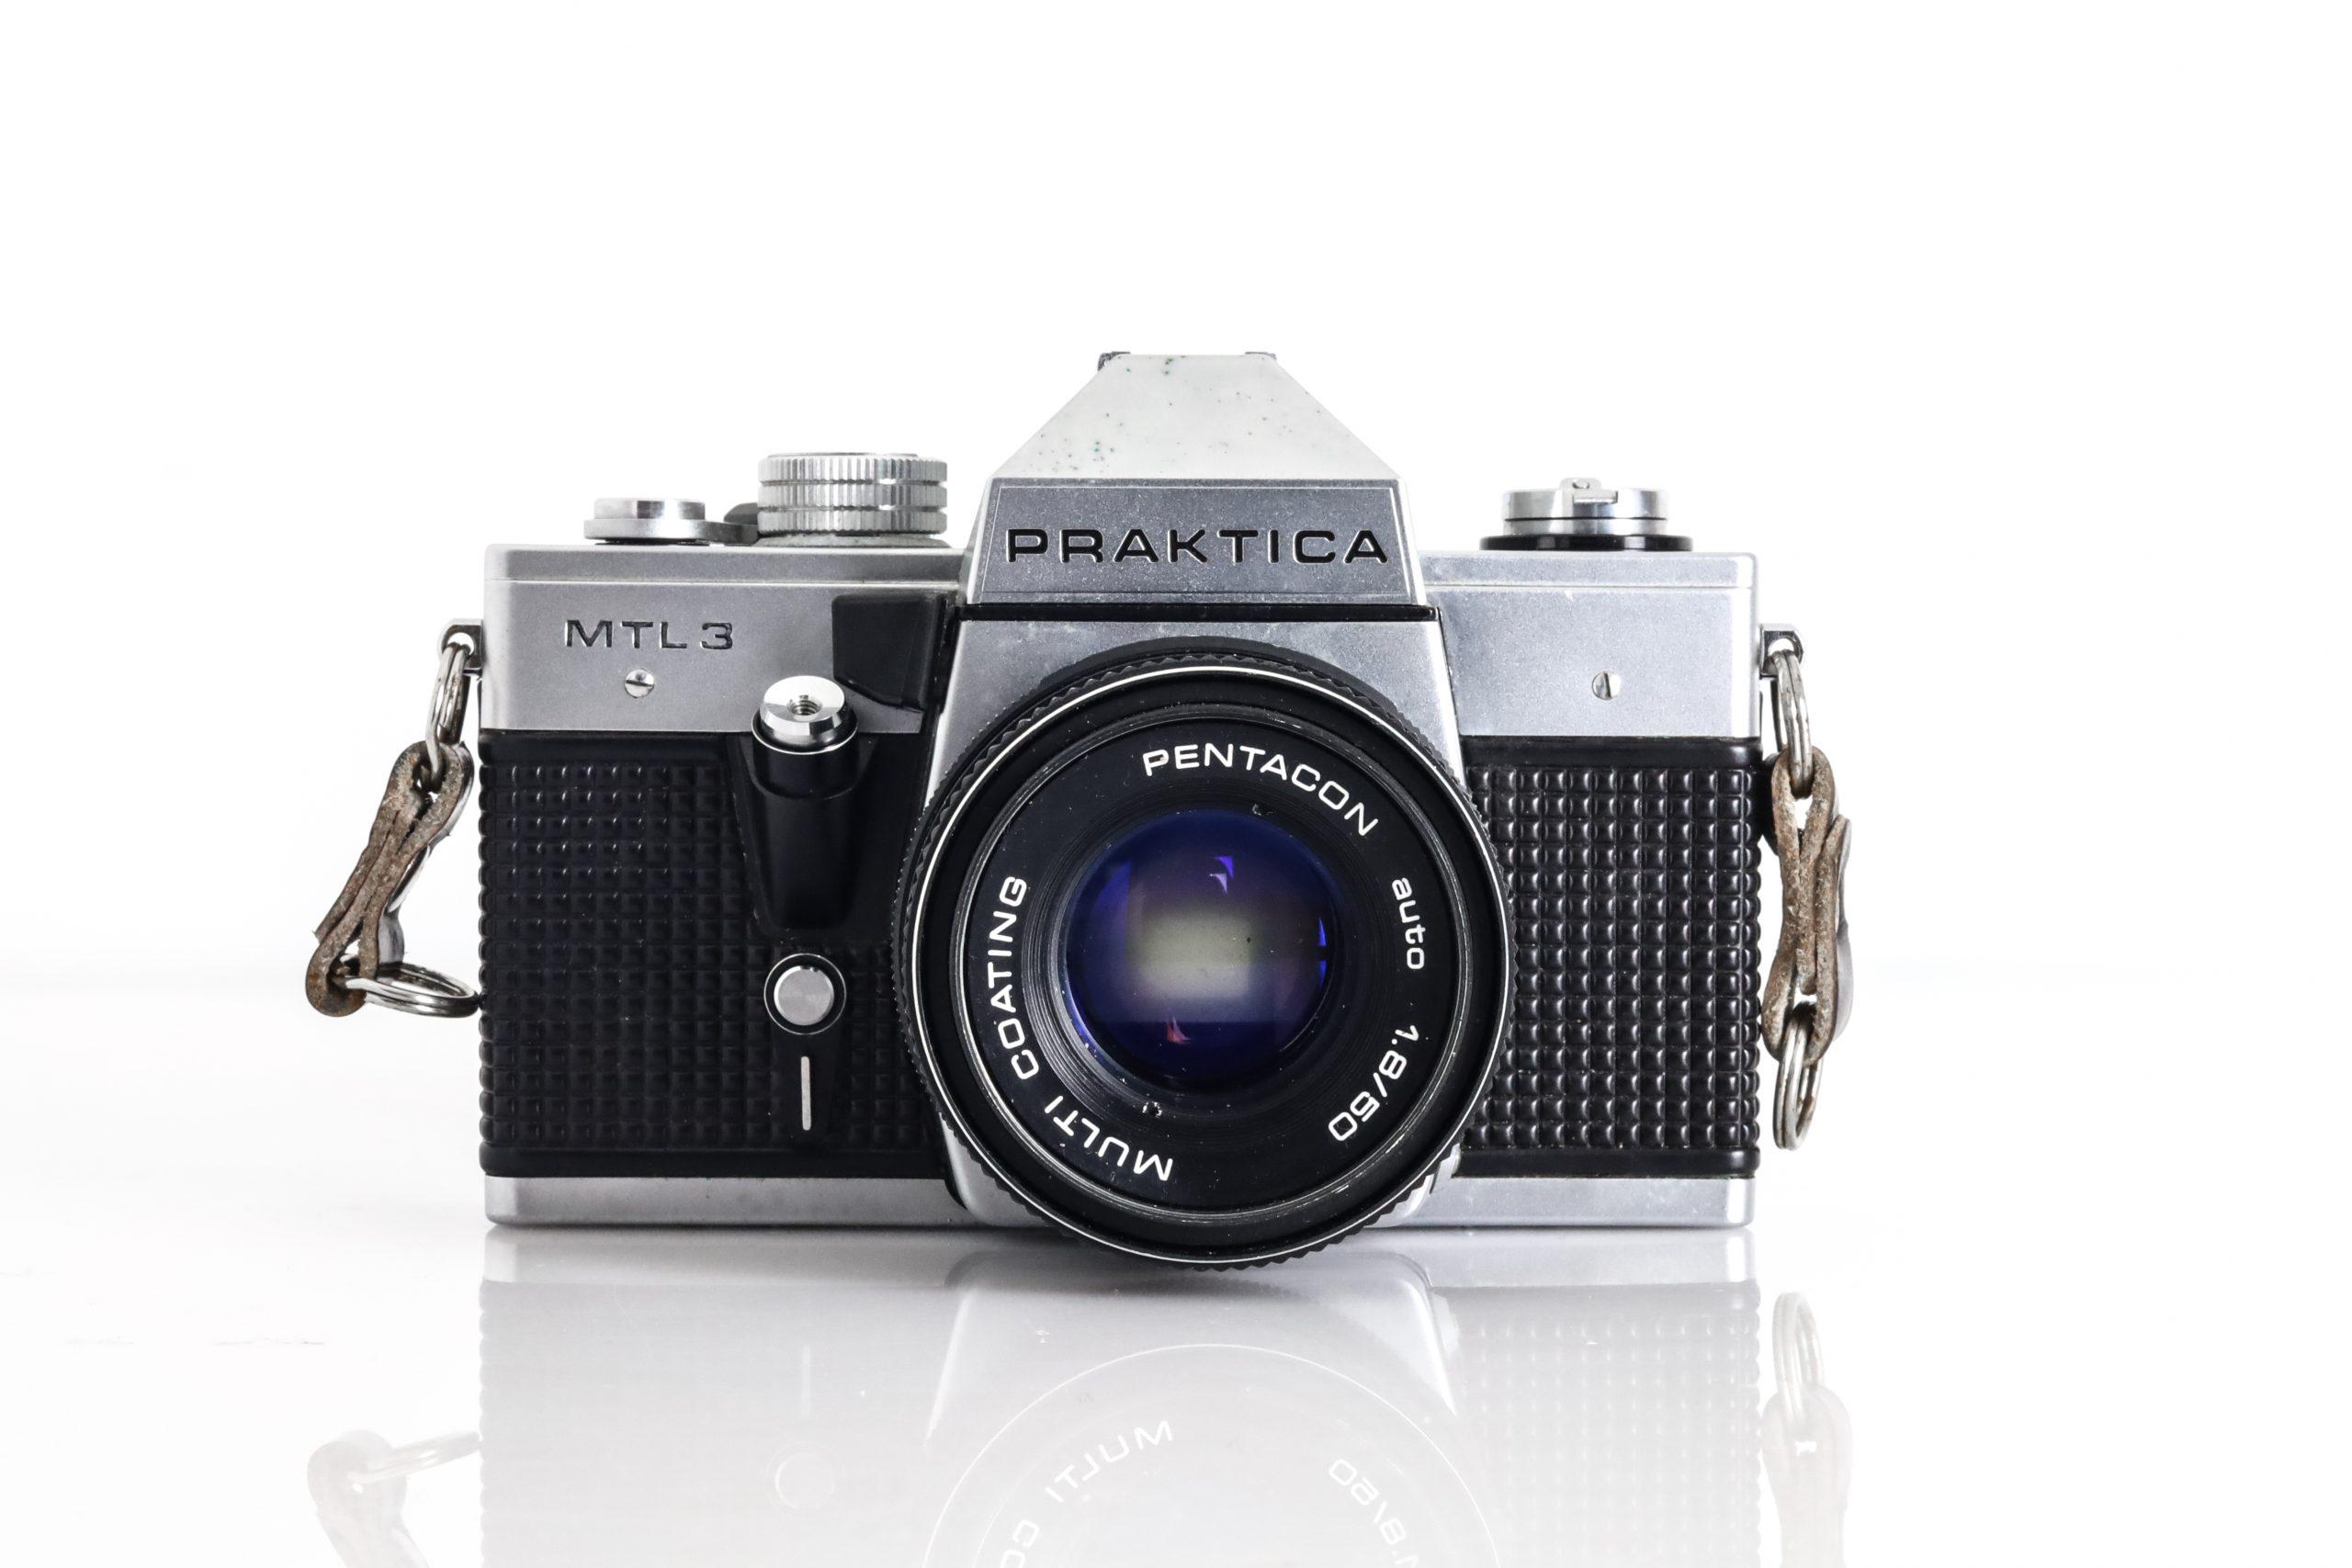 Praktica MTL 3 35mm Film Camera with (Faulty) Pentacon Auto 1.8/50mm Lens